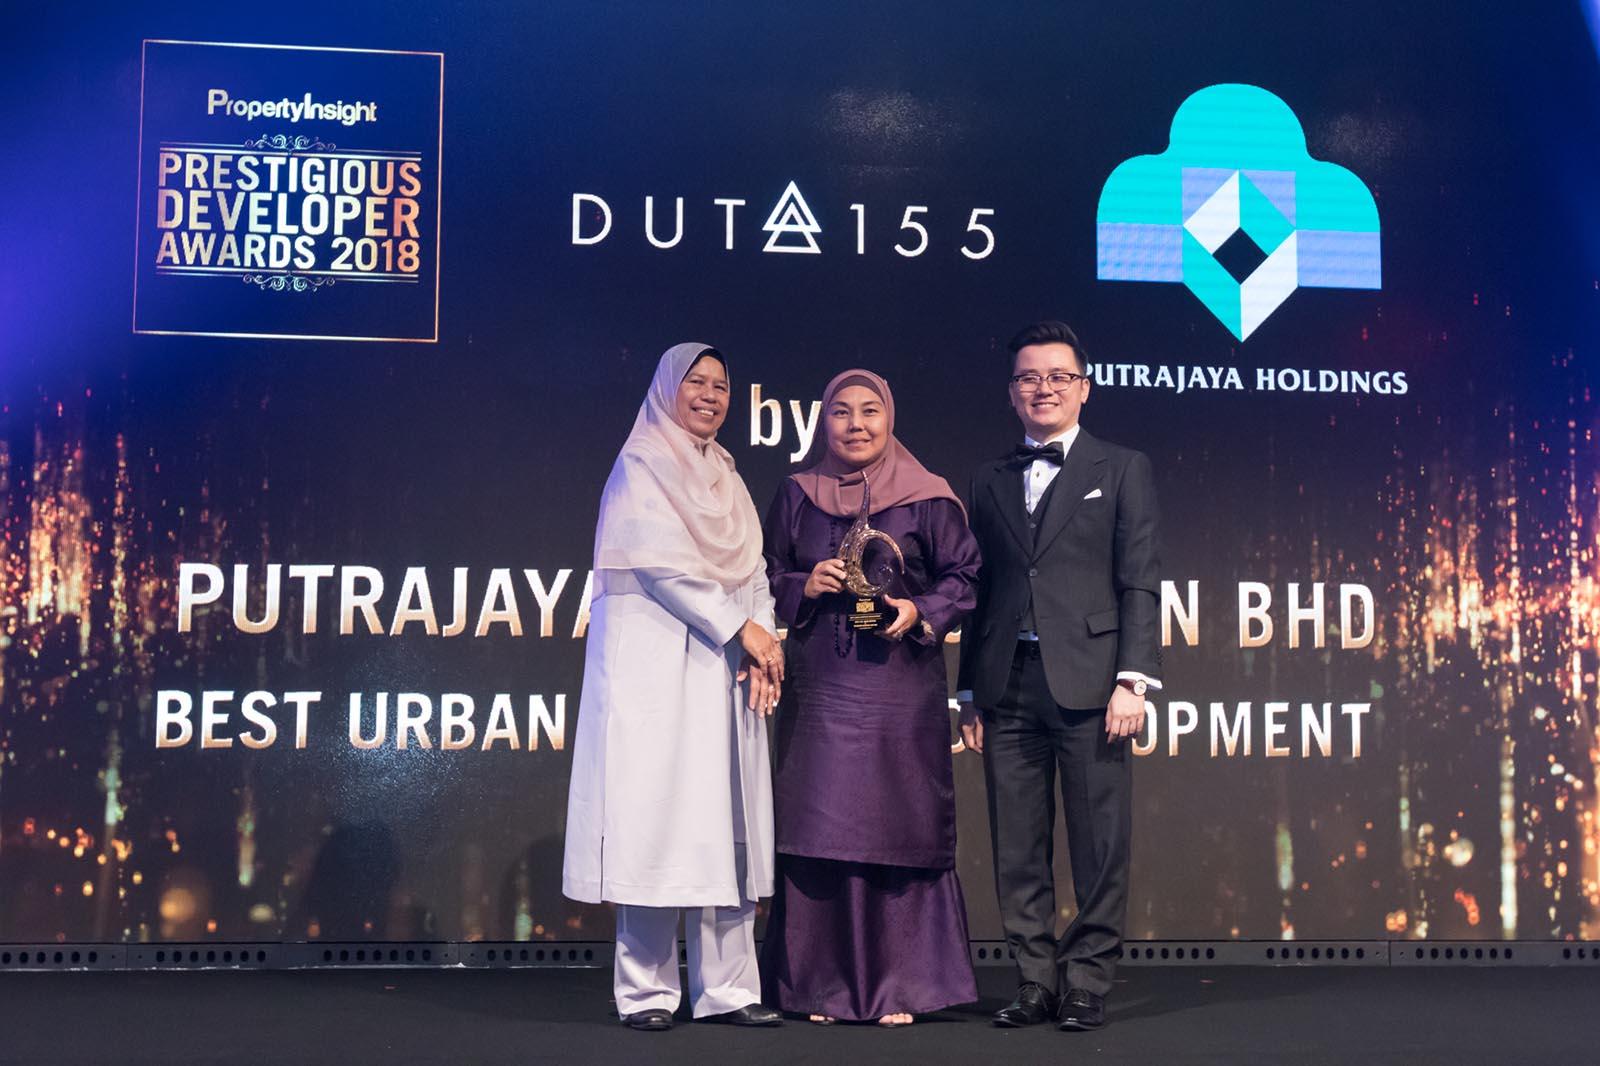 1 June 2018: Property Insights Prestigious Developer Award (PIPDA) 2018 4